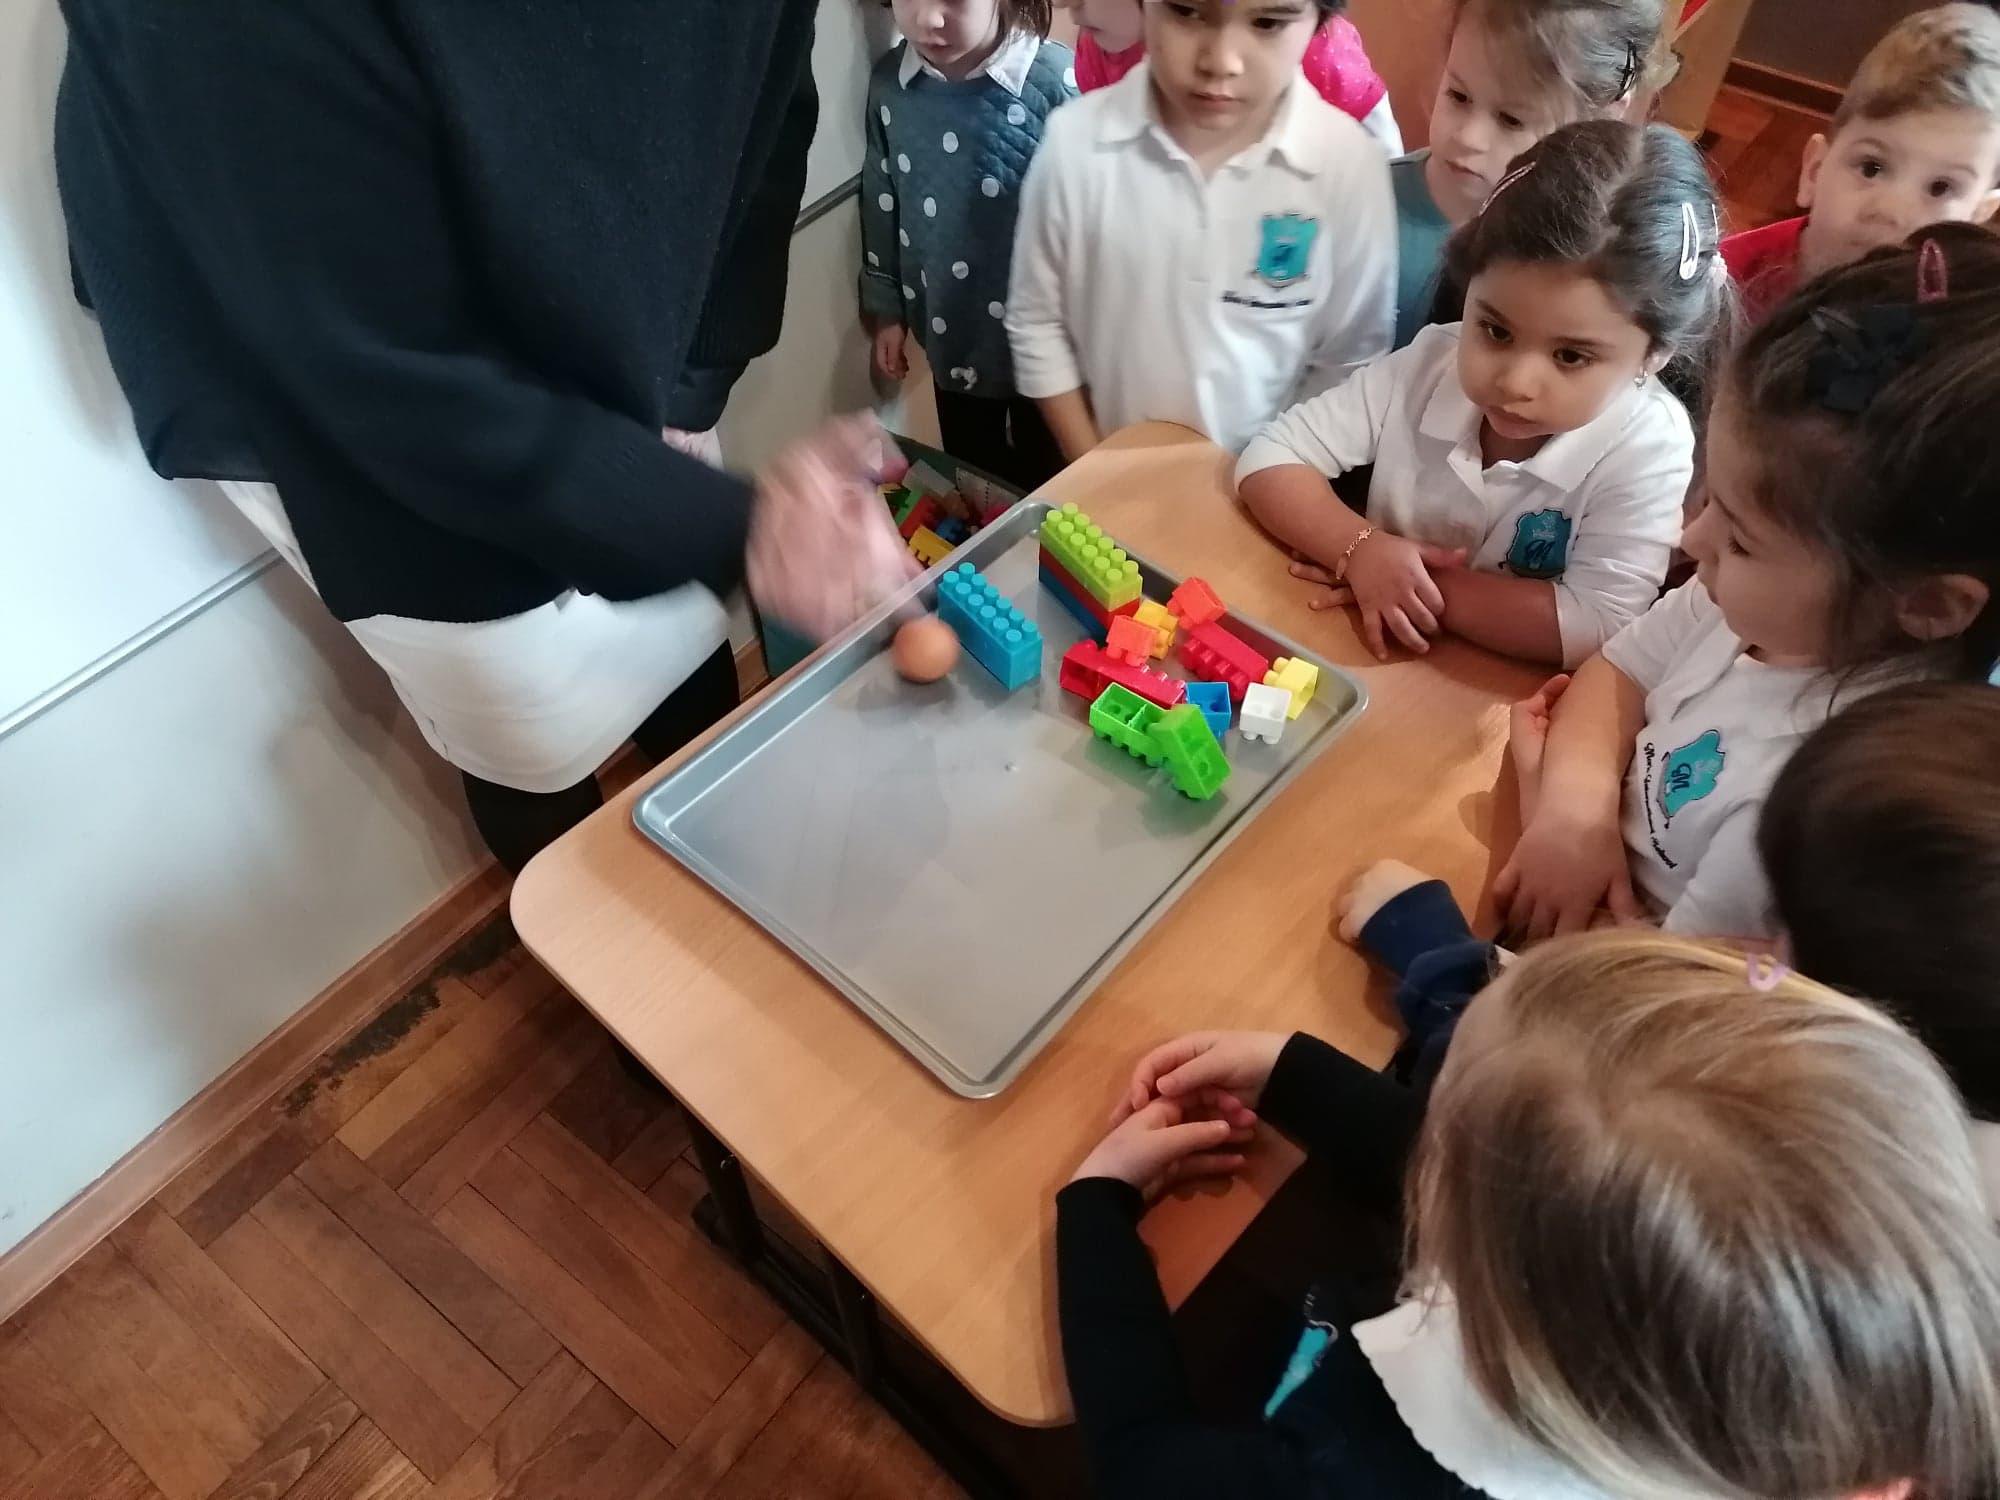 Mini-pre, Preschool And Reception Incorporated A Science And Math Class